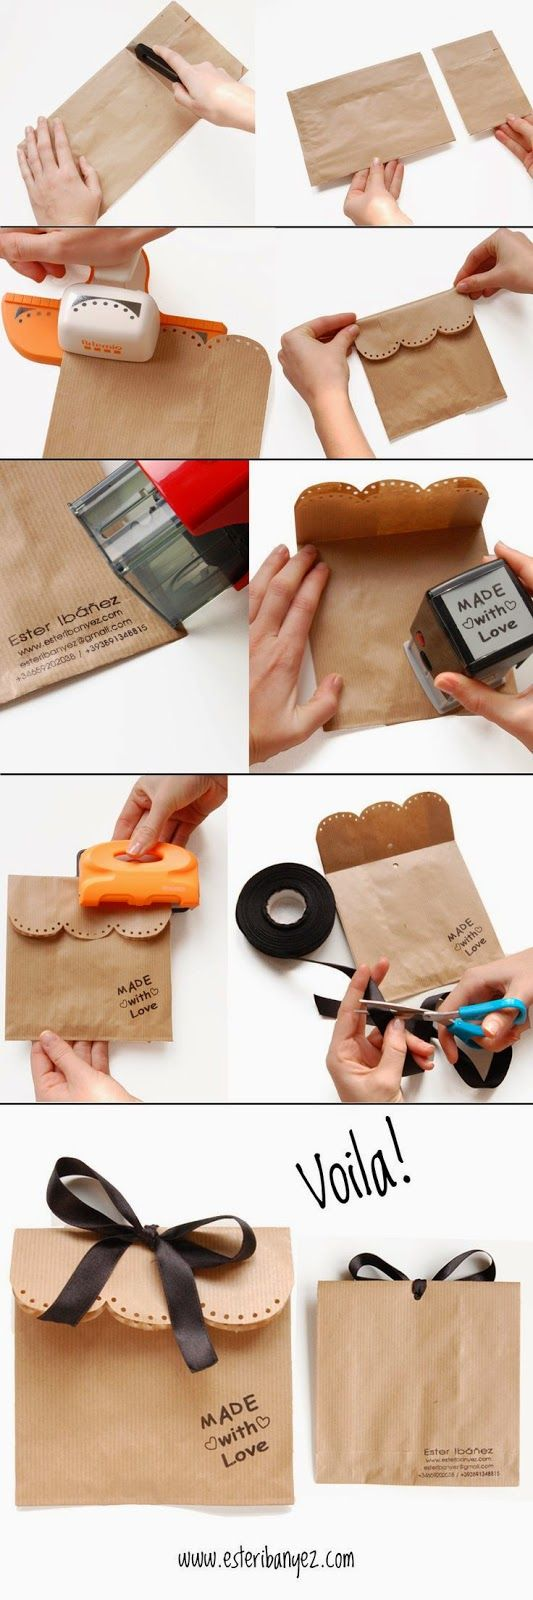 Bri-coco de Lolo: Un petit sac original